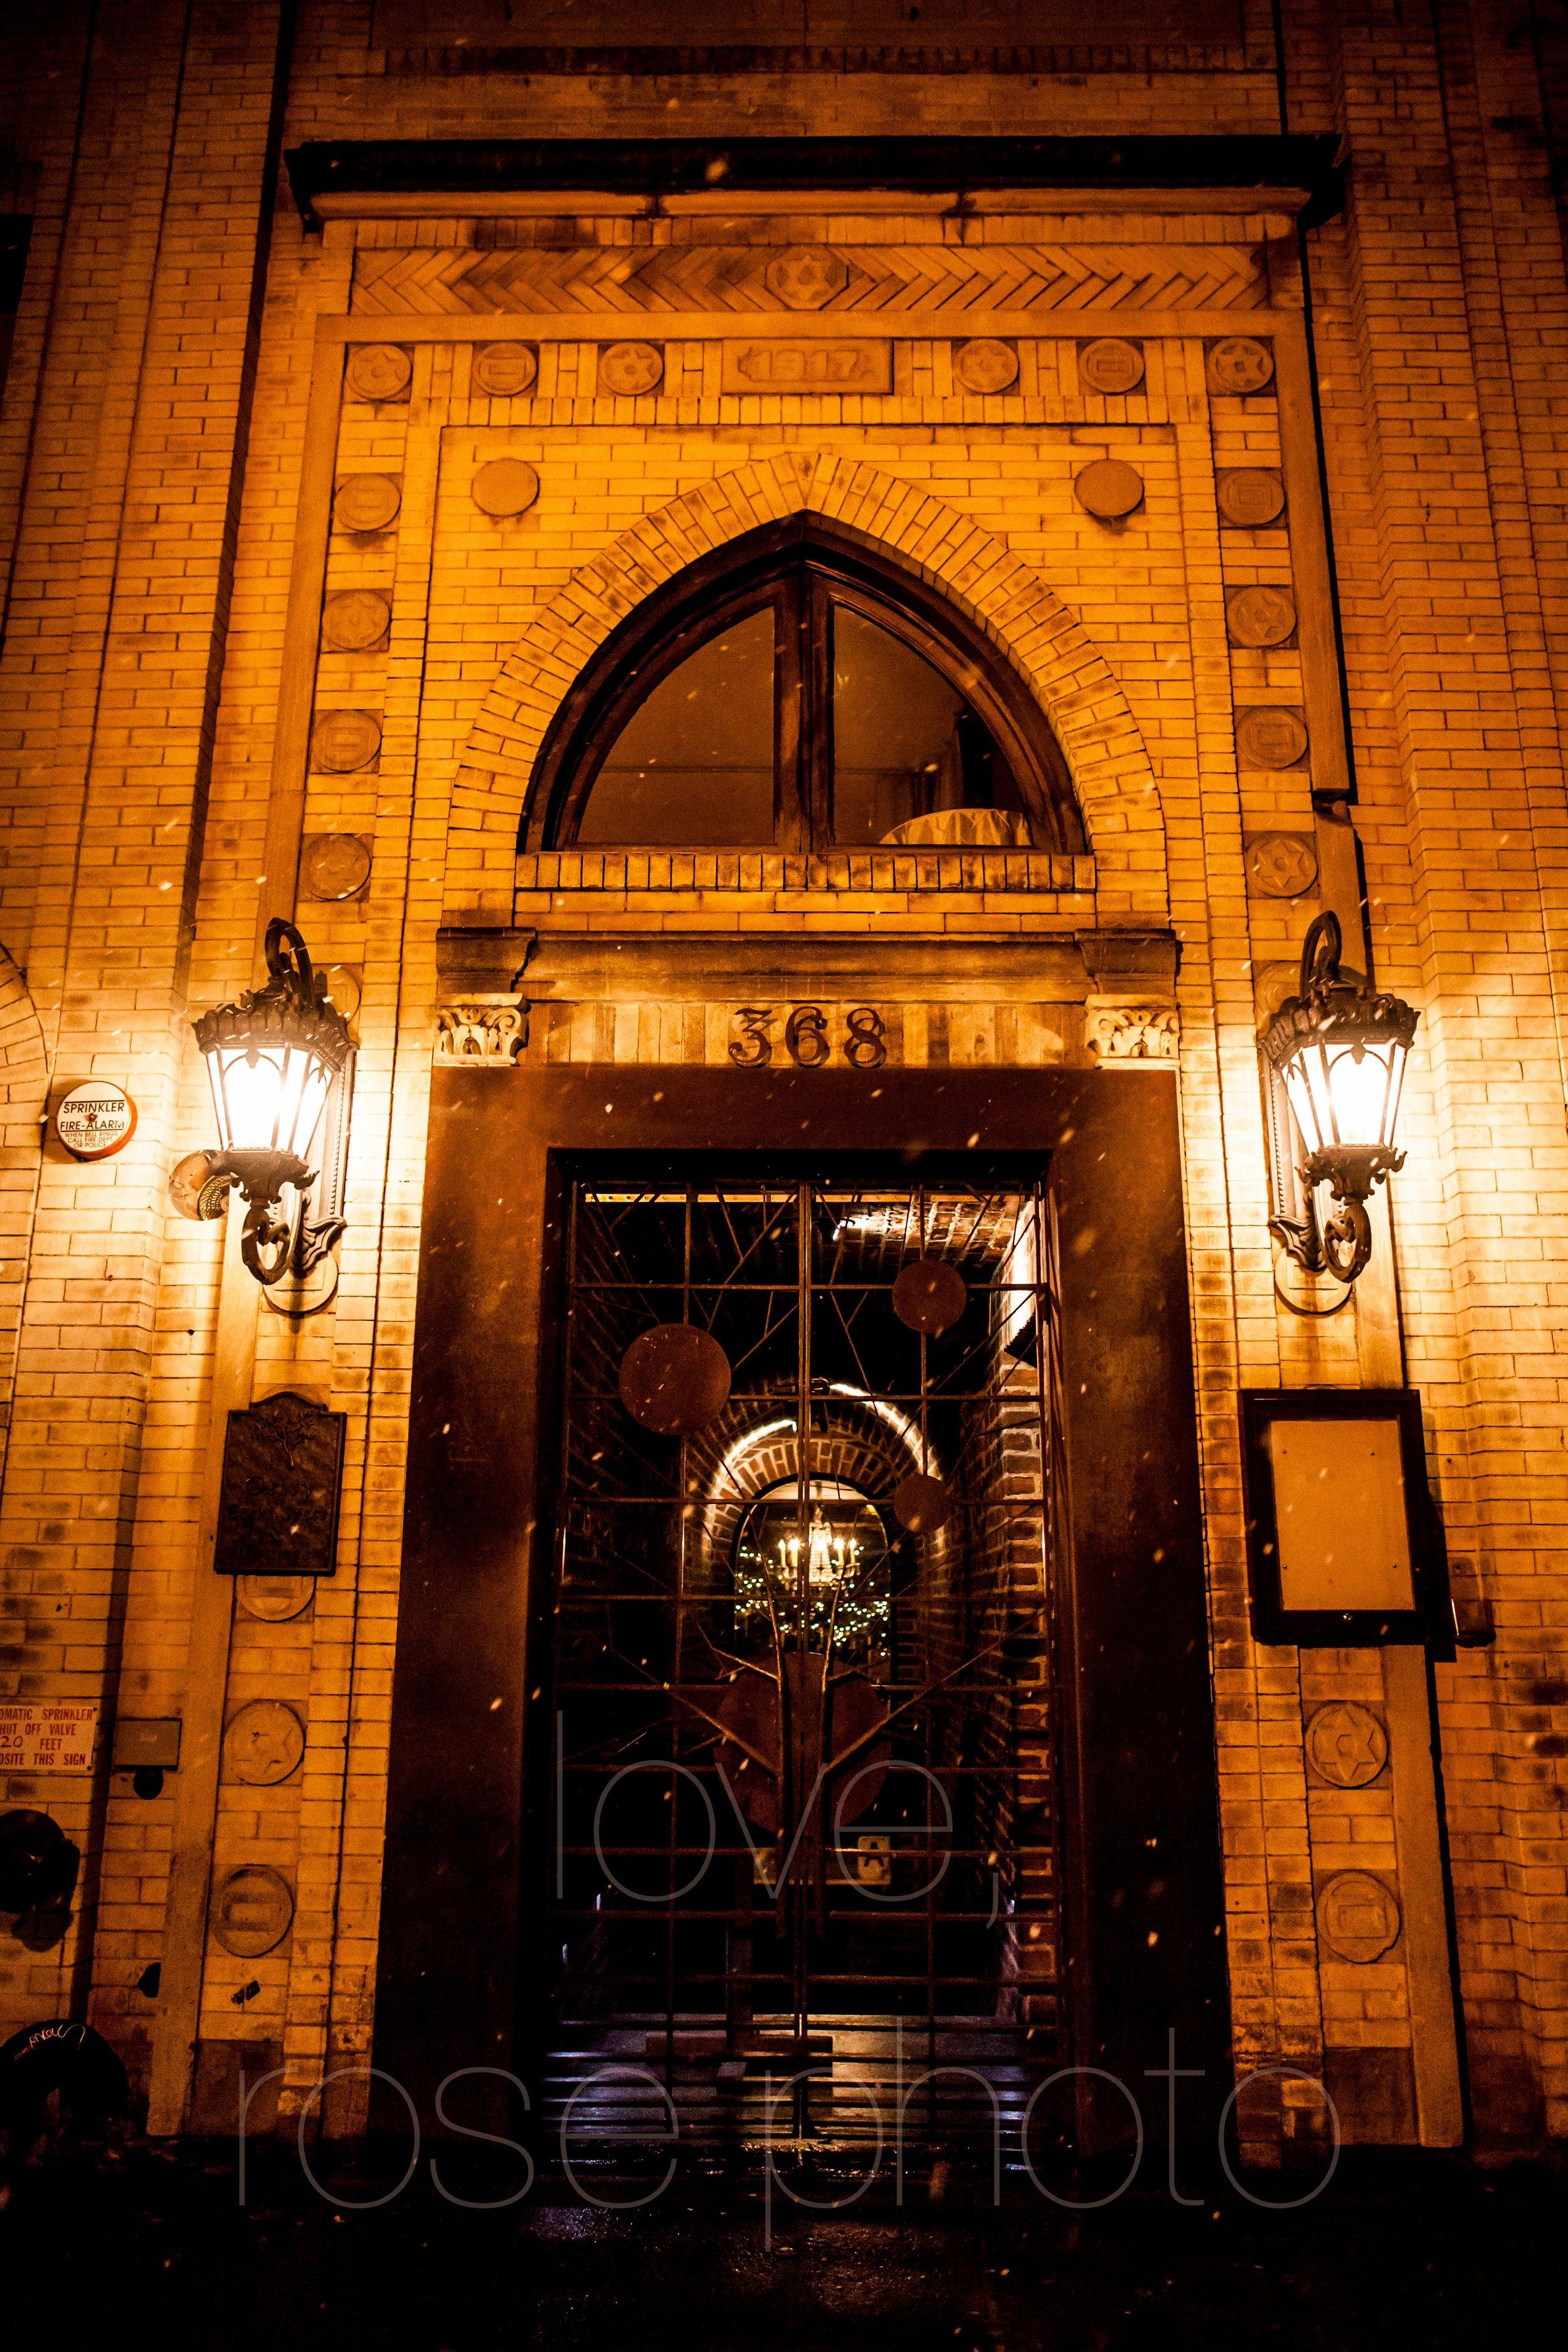 BRACEY rose photo chicago nyc wedding photographer asheville-50.jpg